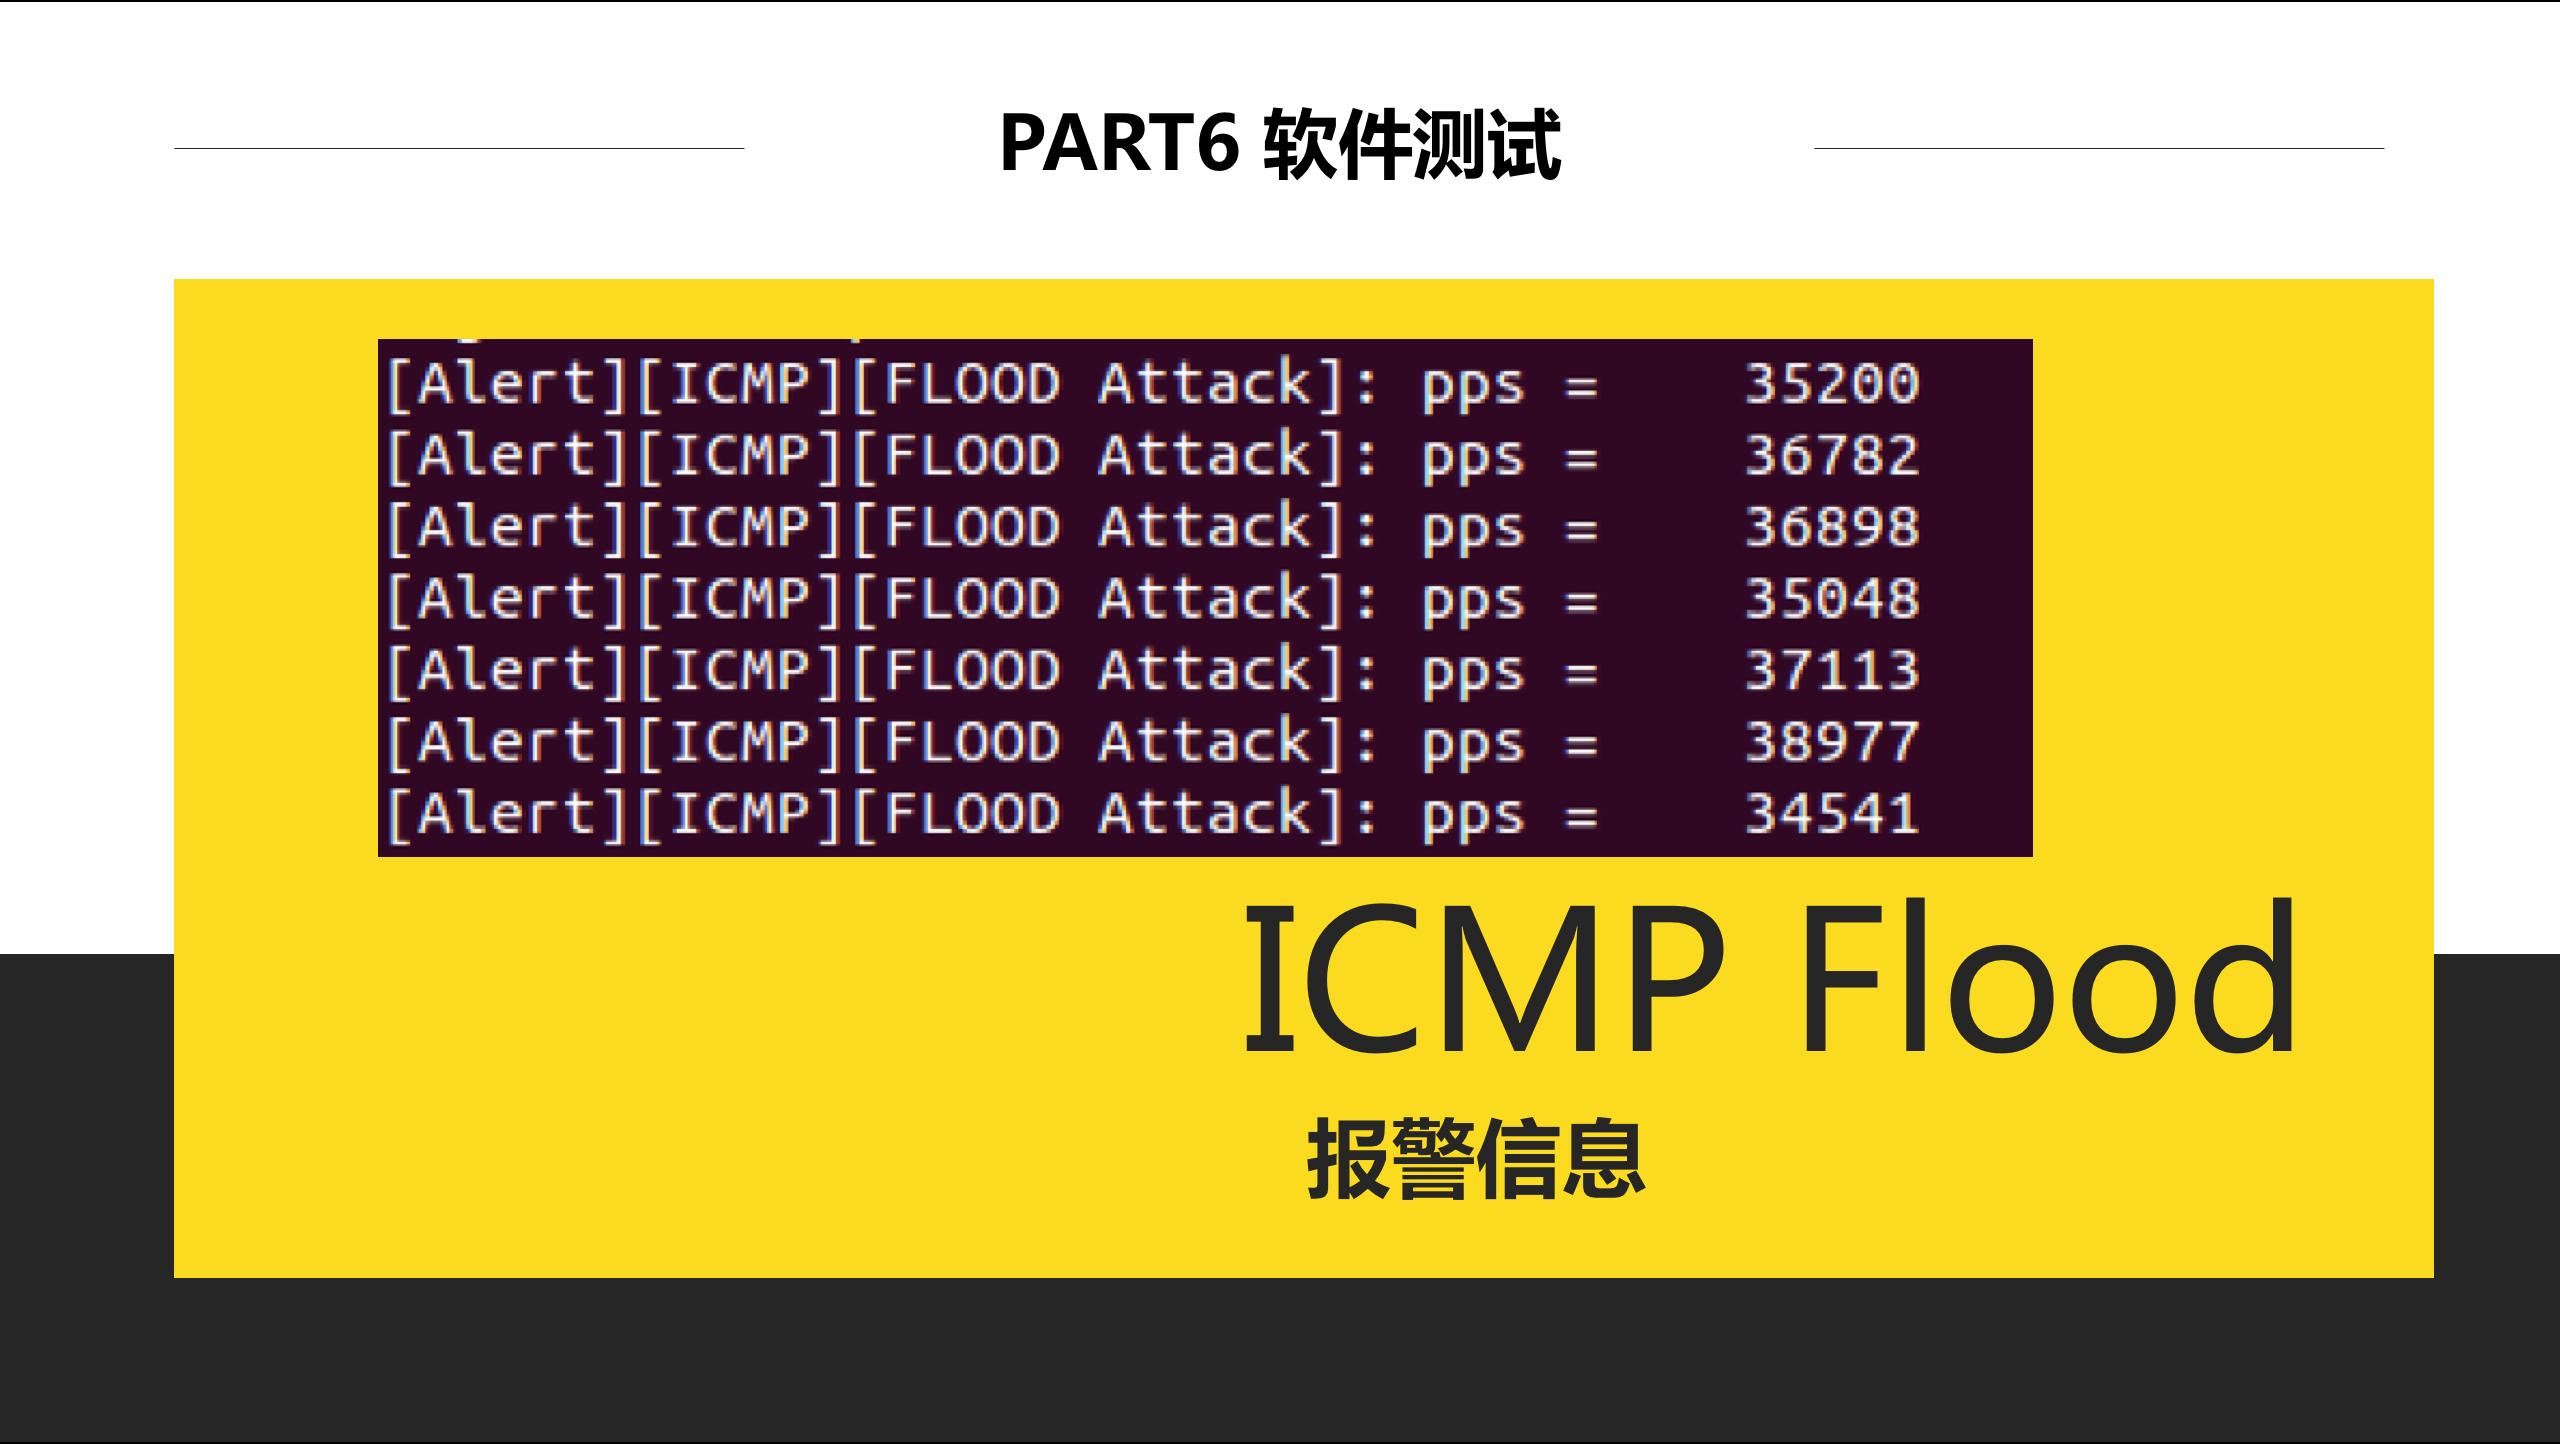 ICMP Flood检测